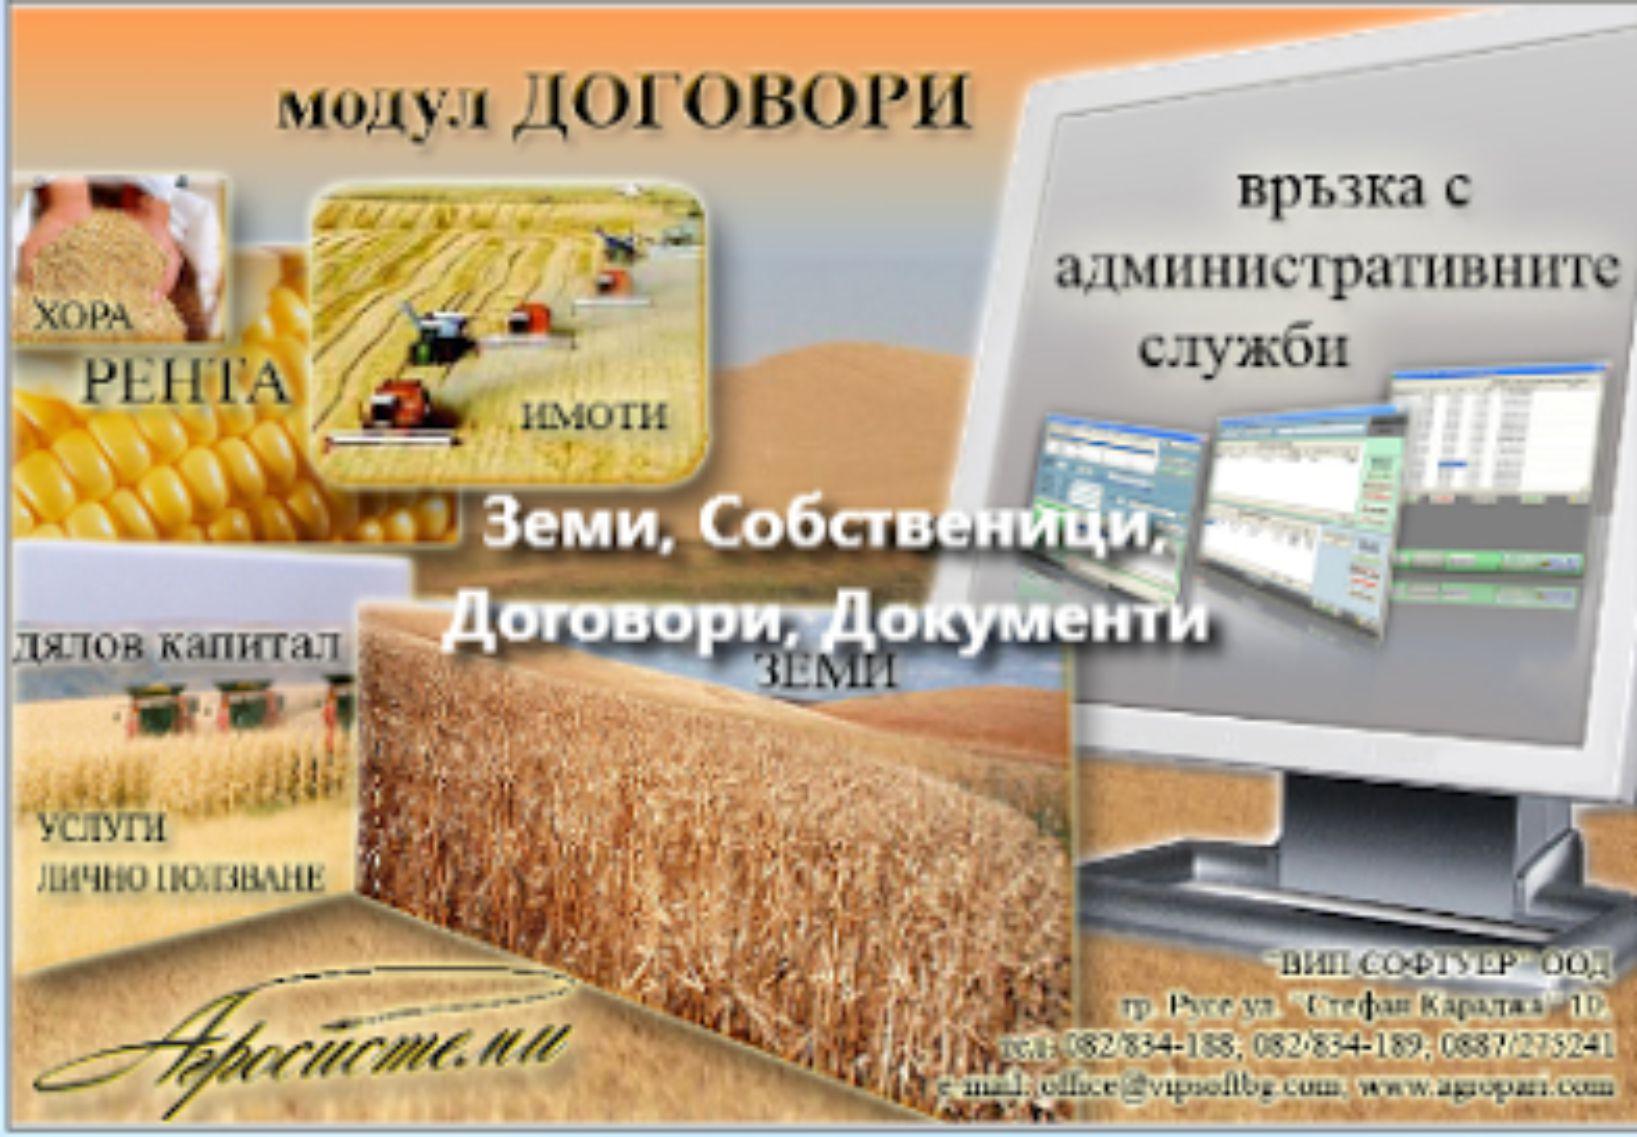 Агросистеми - софтуер за земеделие, цялостна интегрирана система